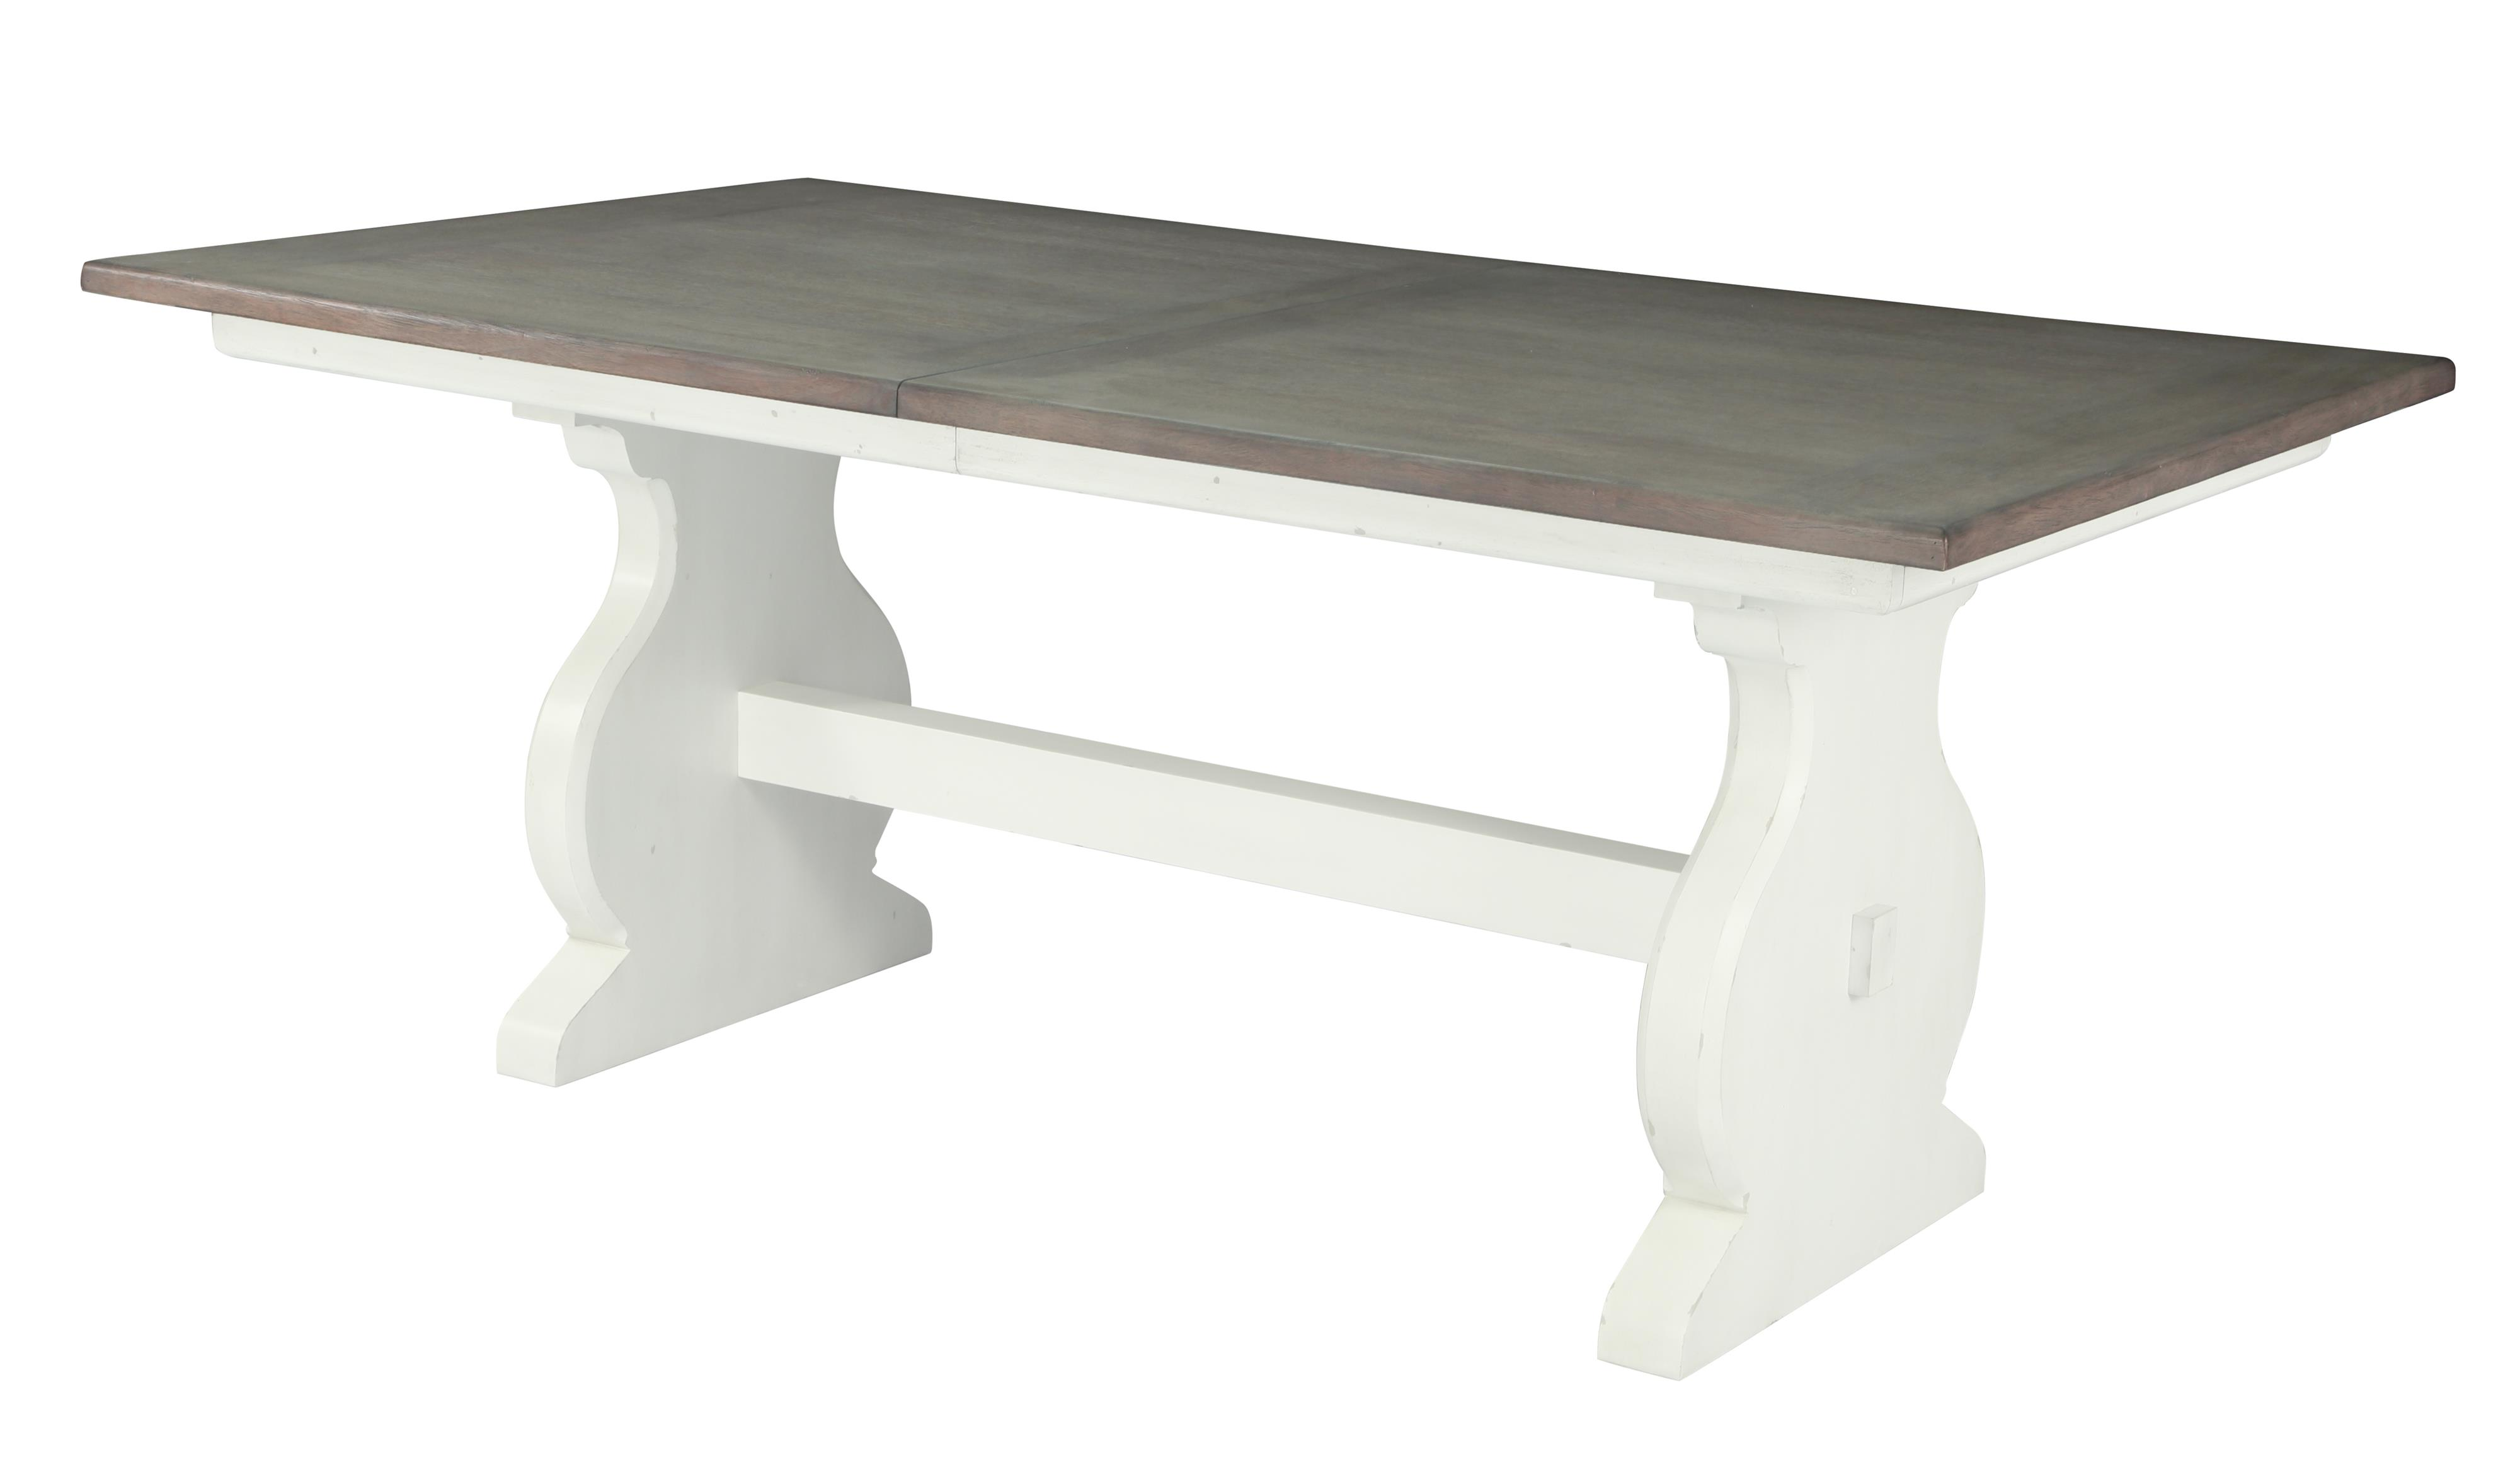 Belfort Select Magnolia Park Rectangular Dining Table - Item Number: D3681-21